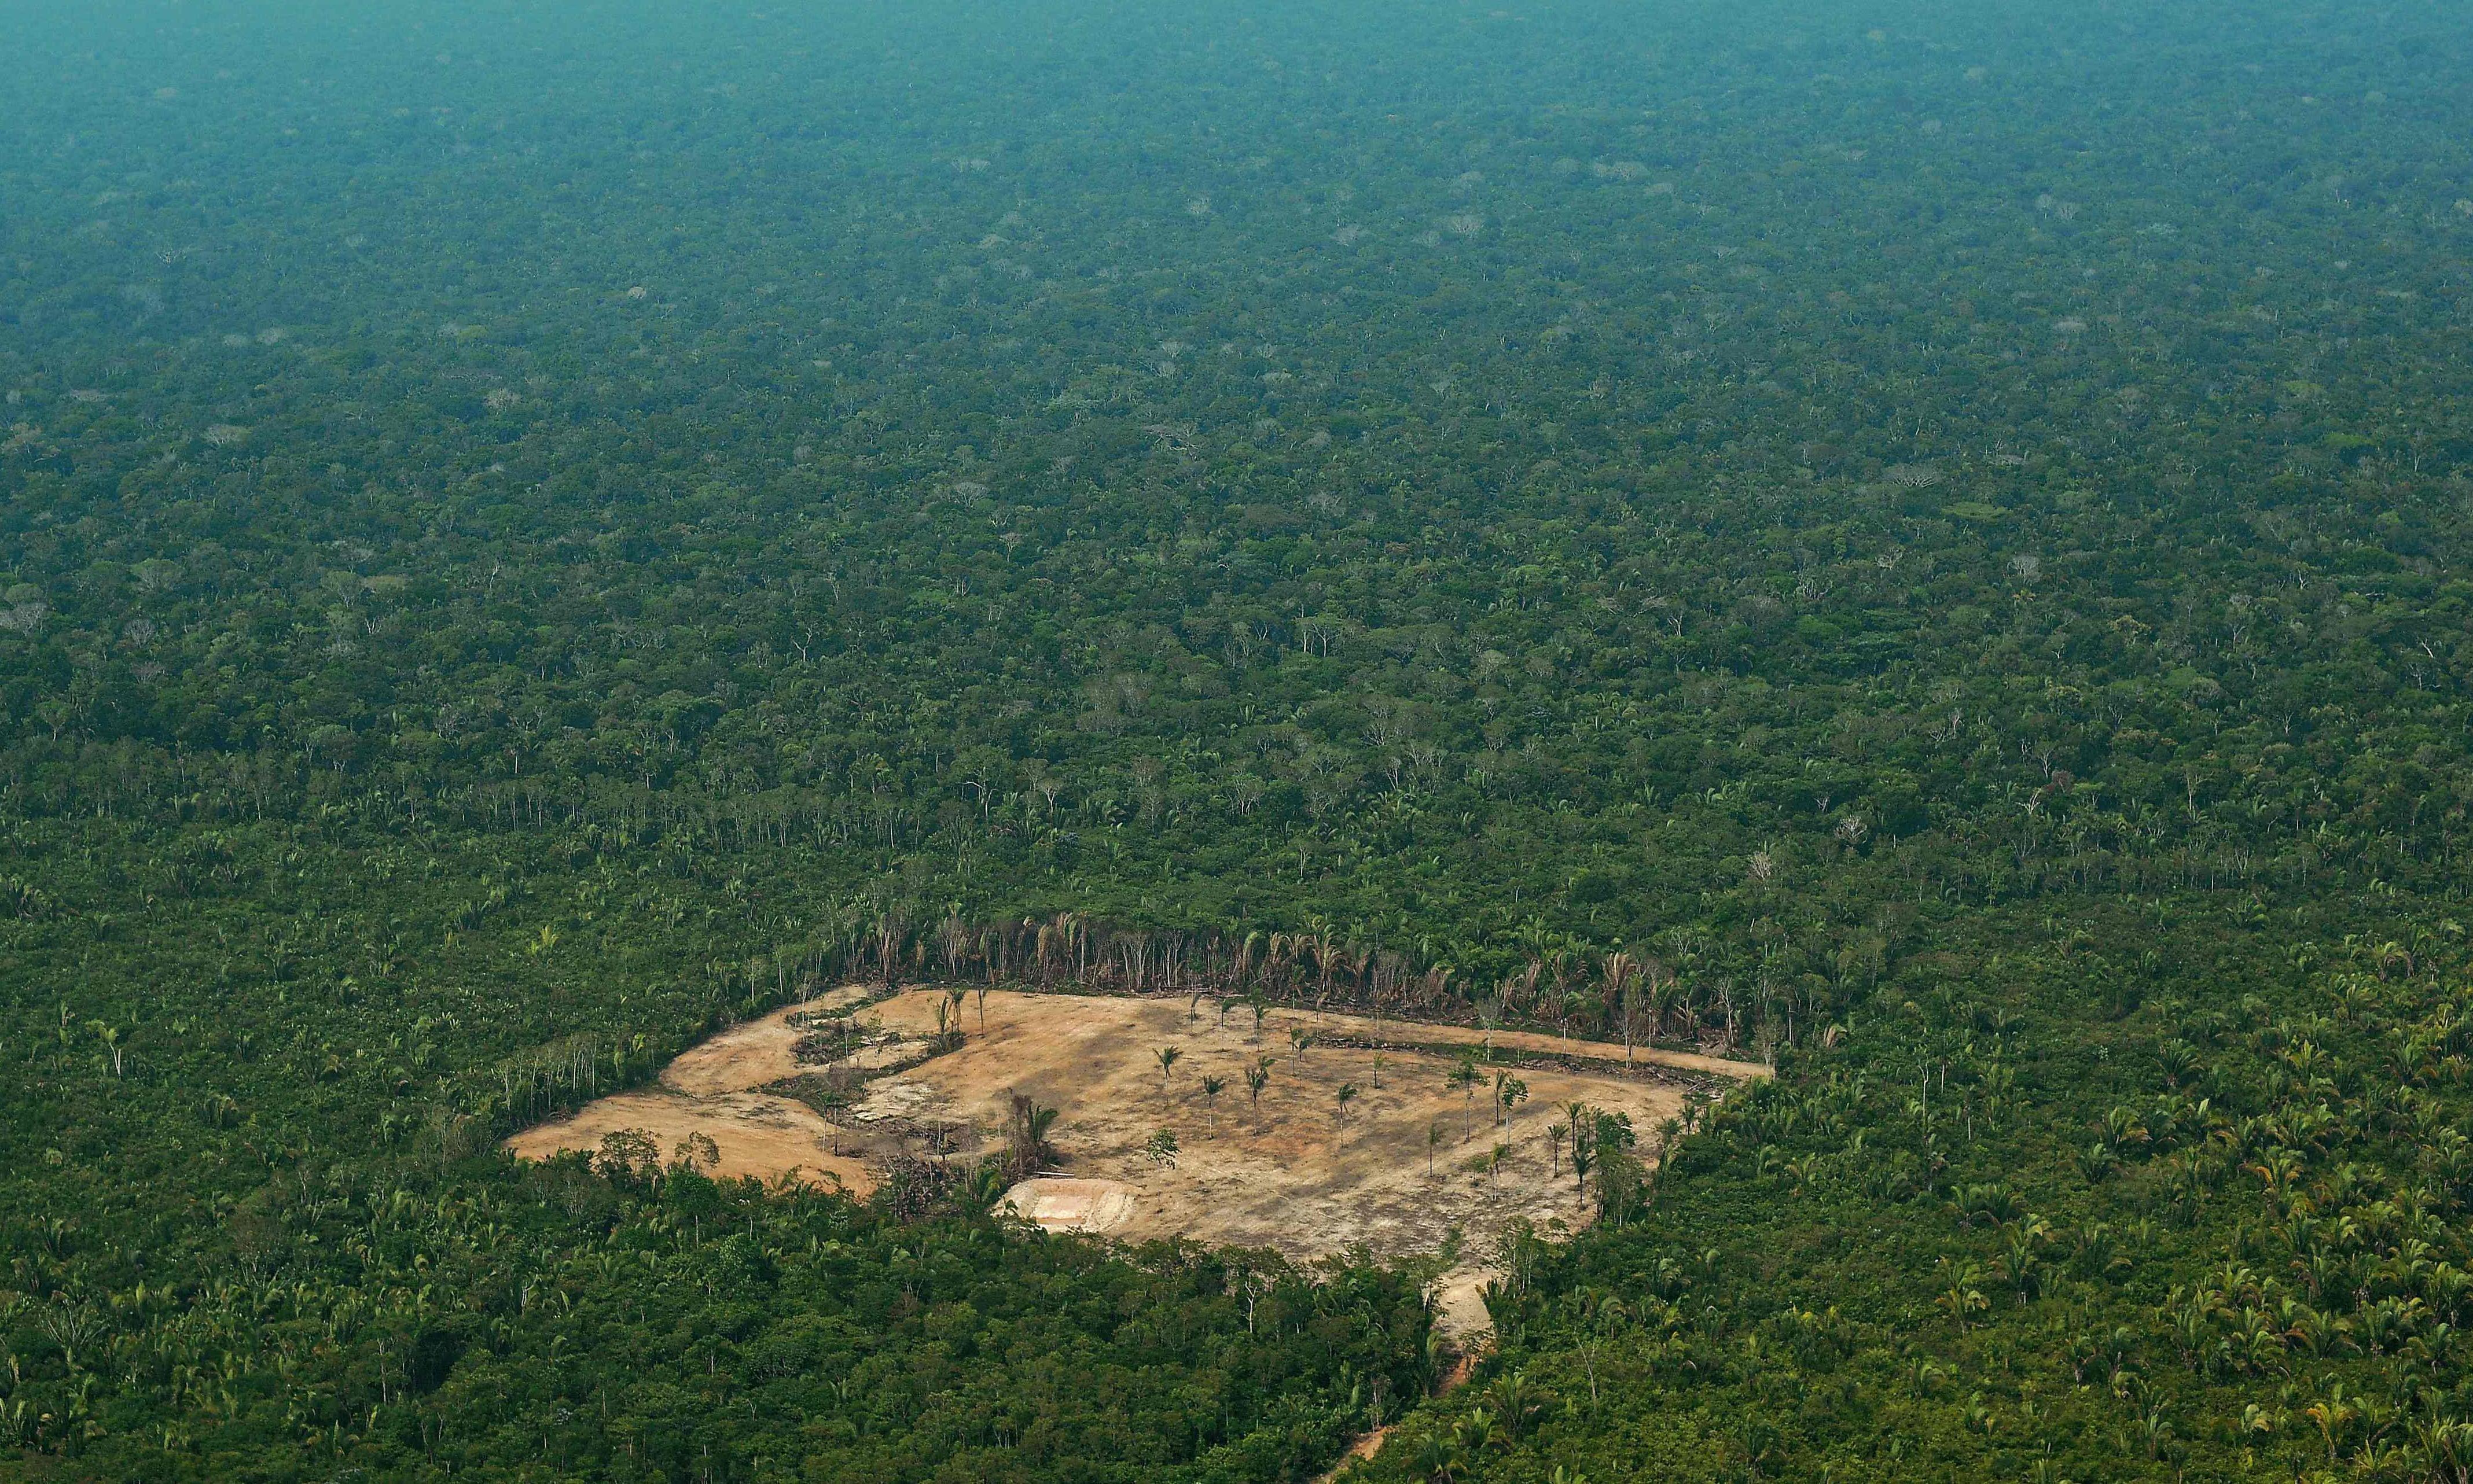 Amazon indigenous groups propose Mexico-sized 'corridor of life'